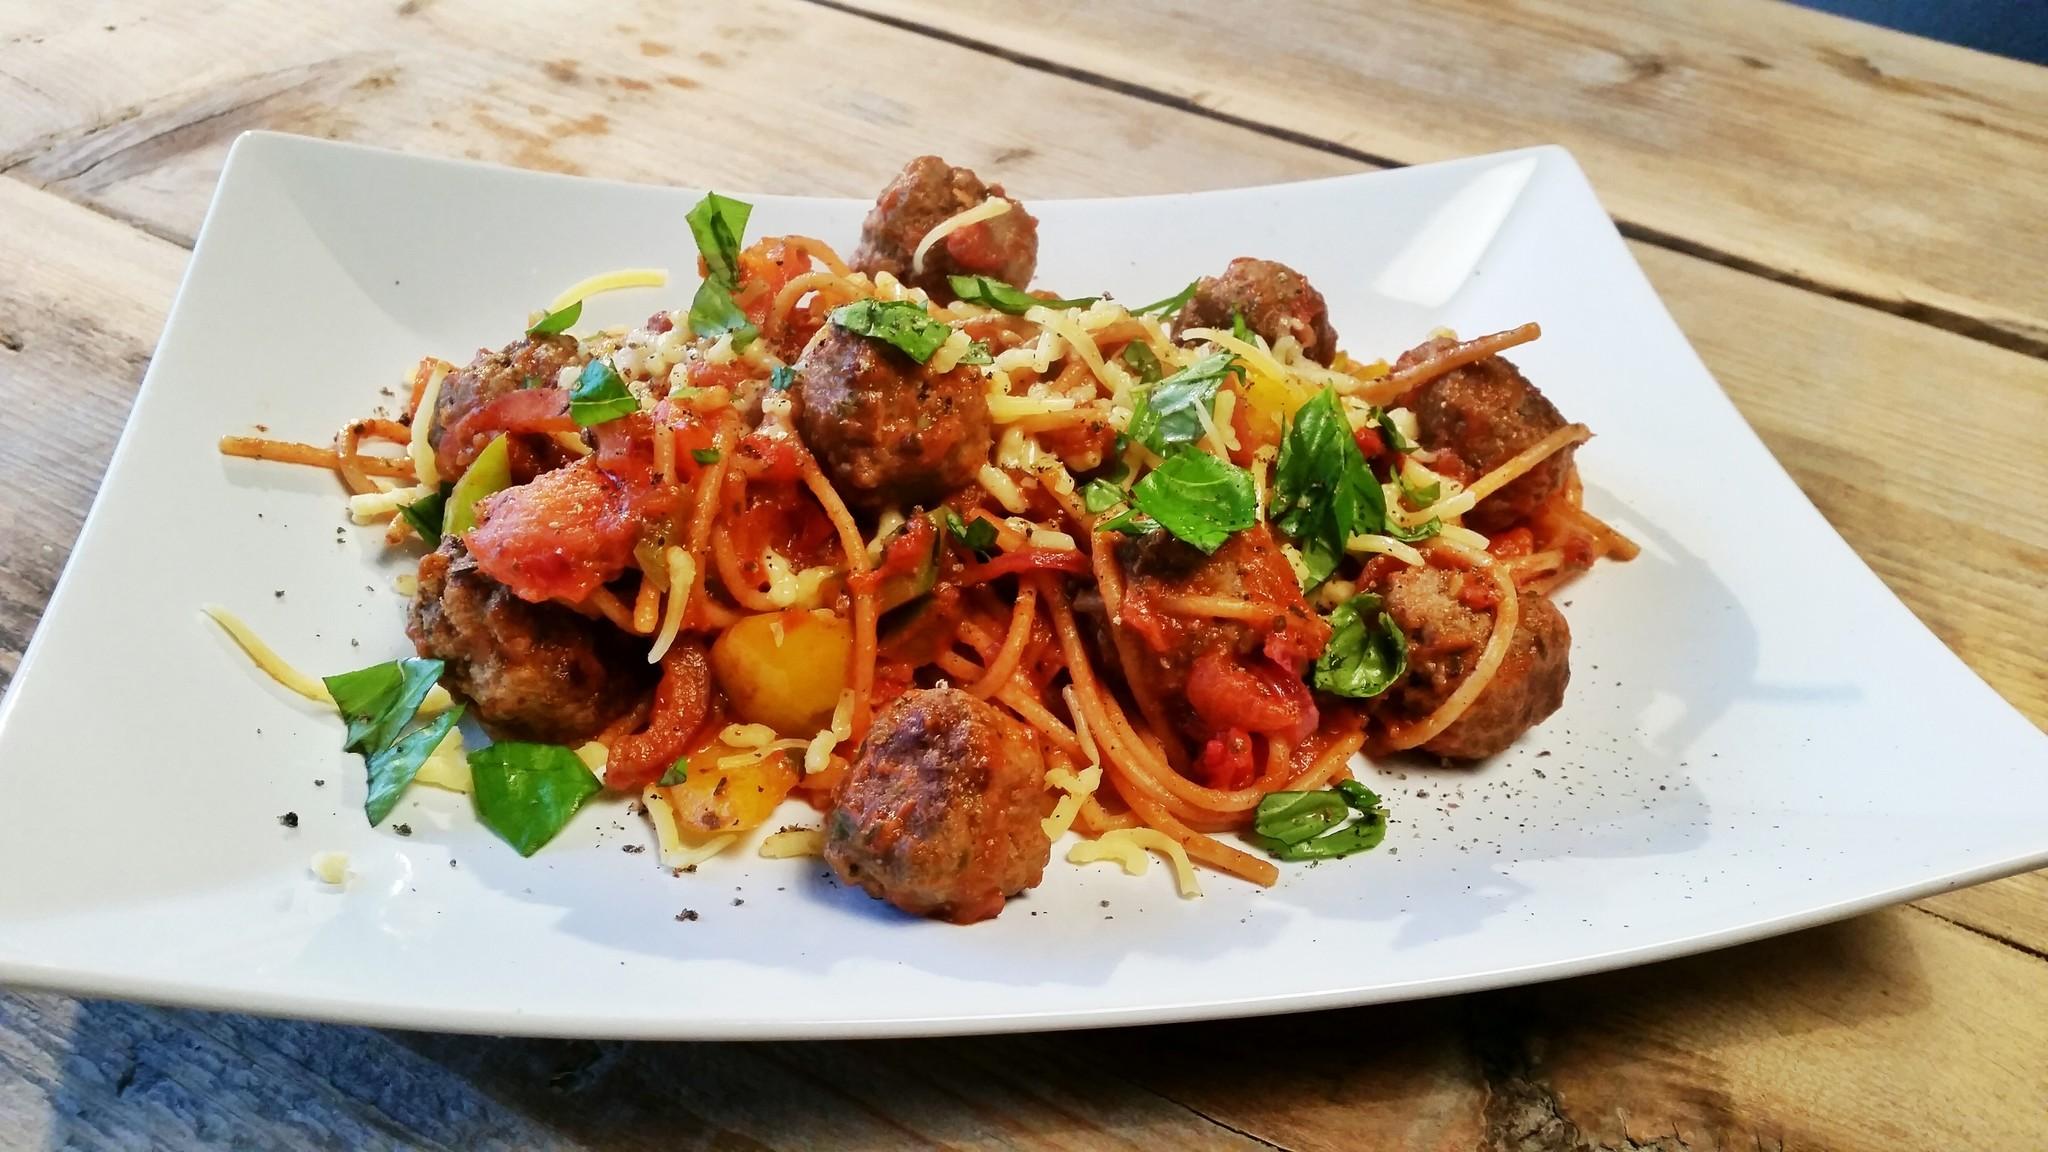 Spaghetti lekker gevuld met groente, kipdij en groene pesto